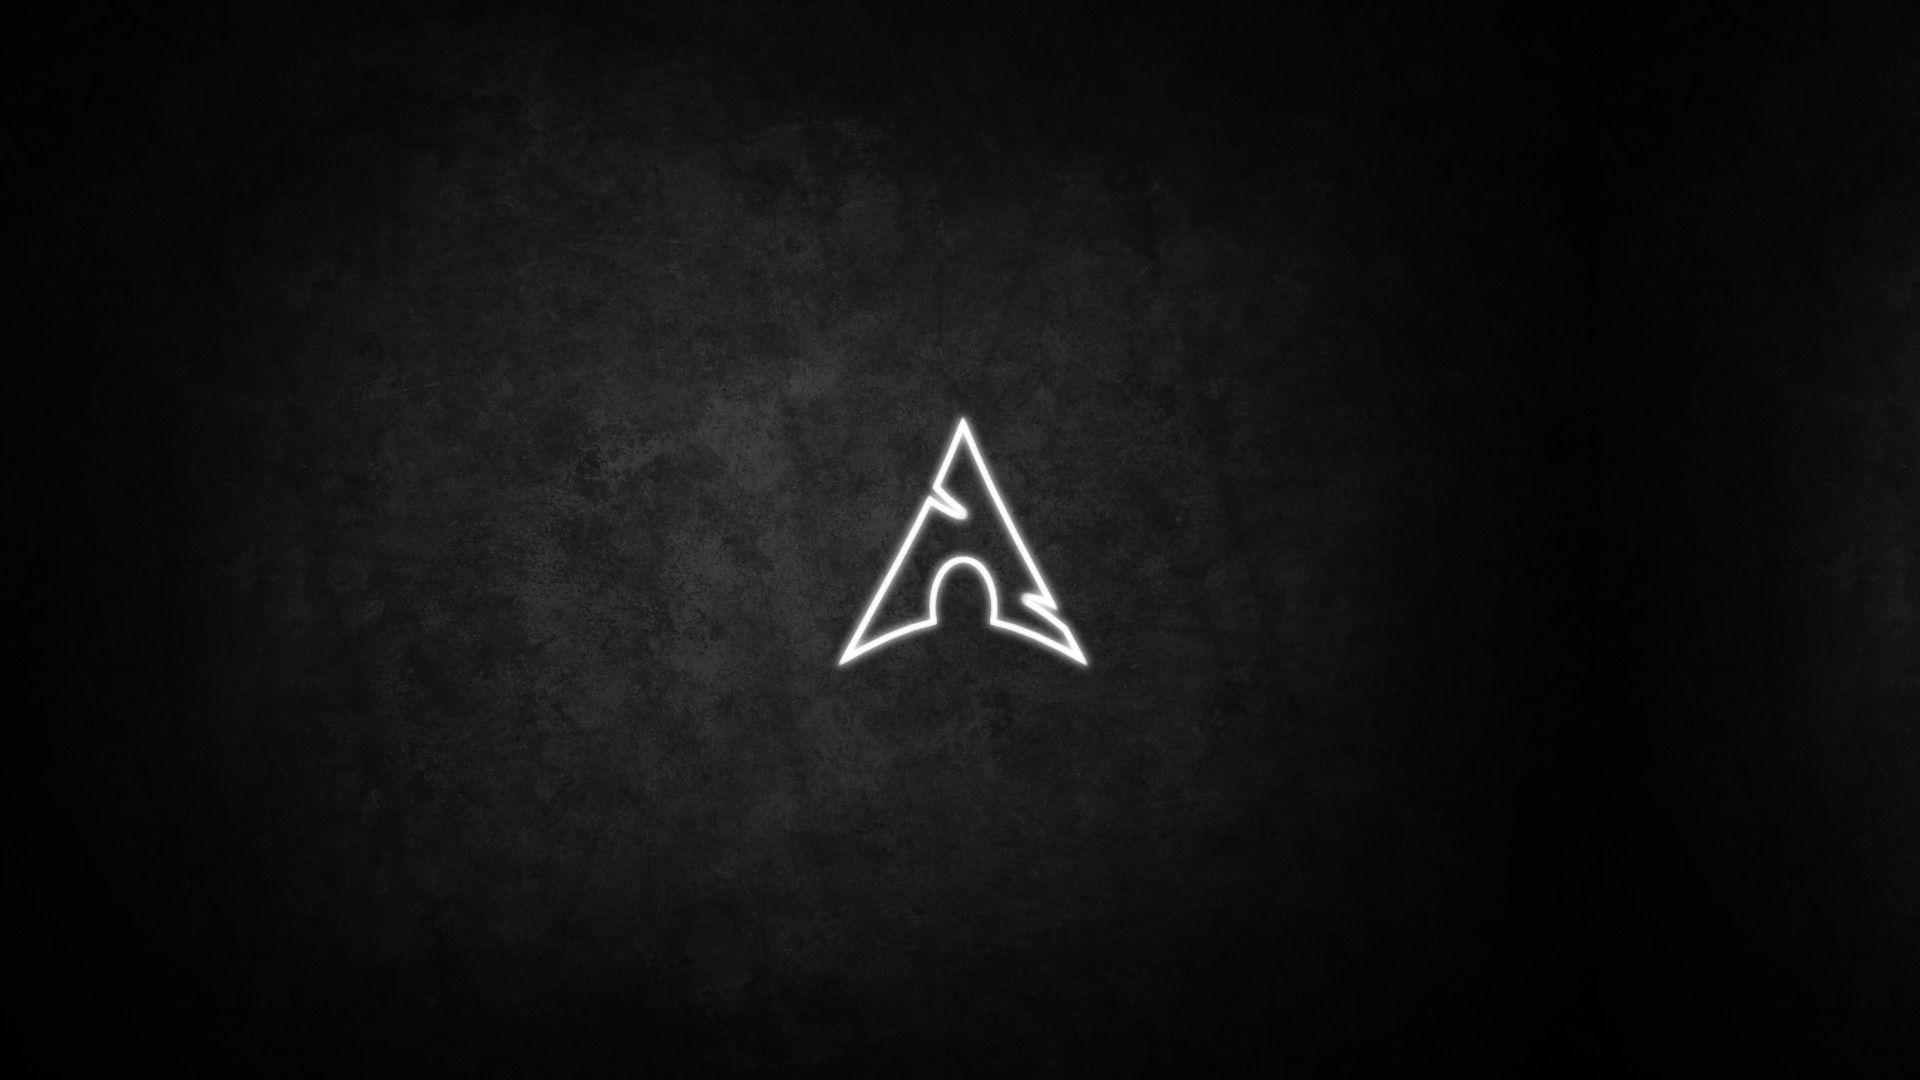 Arch hd image